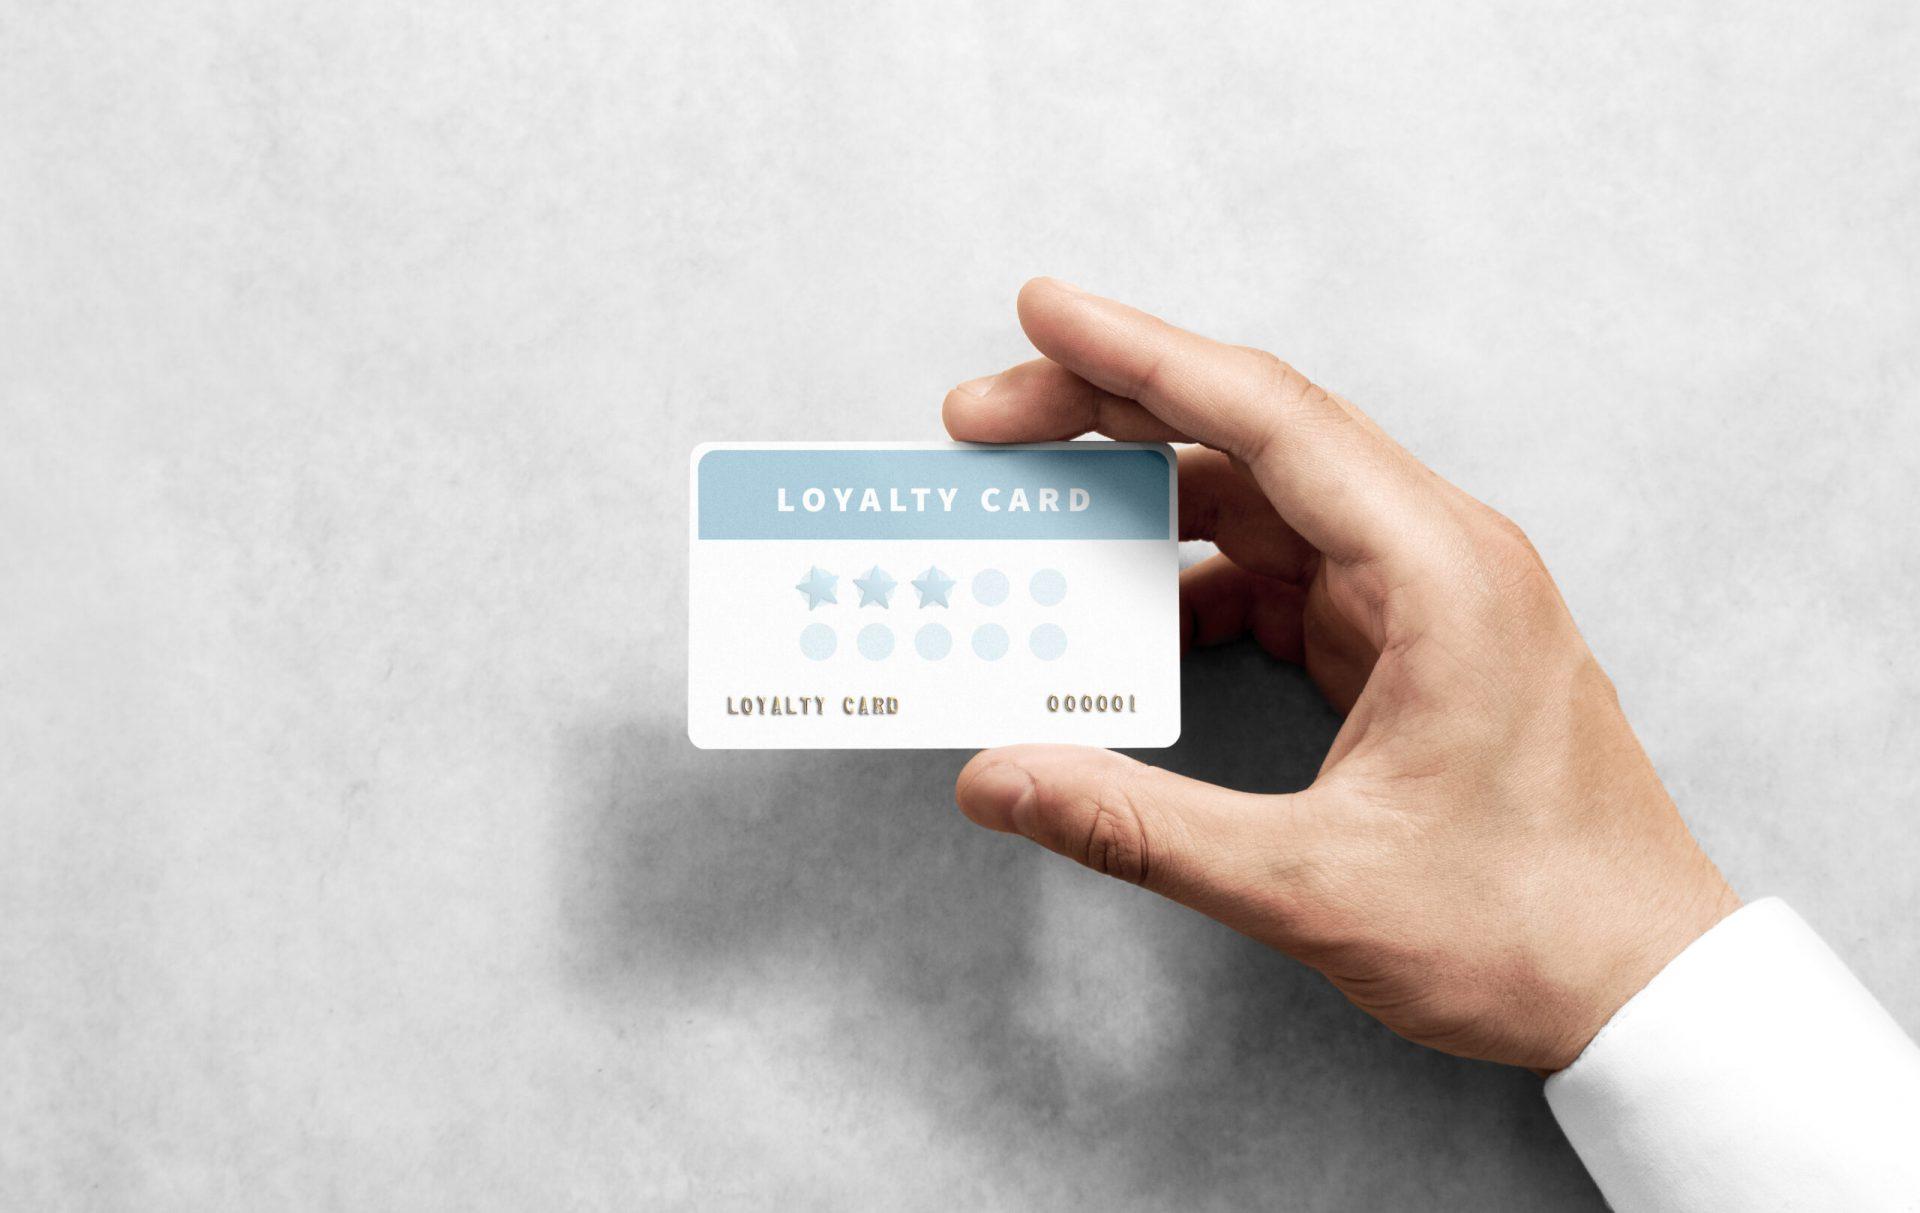 hand holding restaurant customer loyalty program card